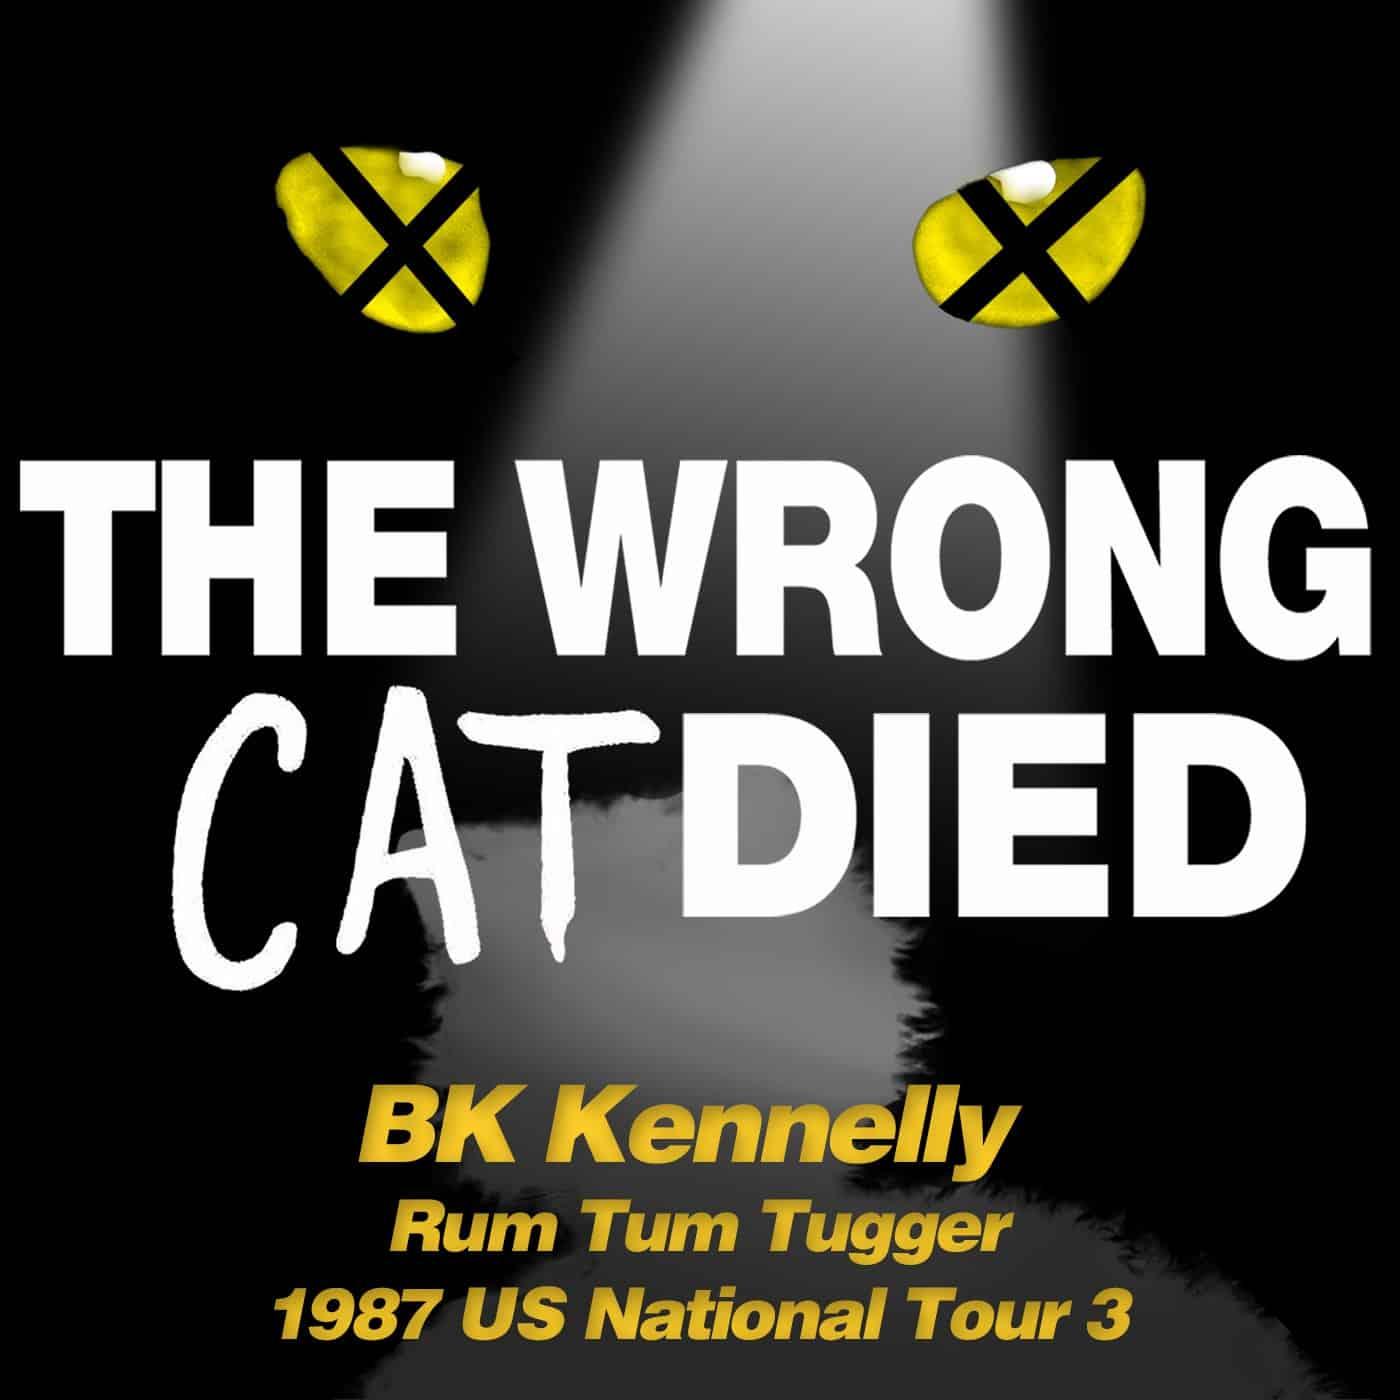 Ep40 - BK Kennelly, Rum Tum Tugger on 1987 US National Tour 3